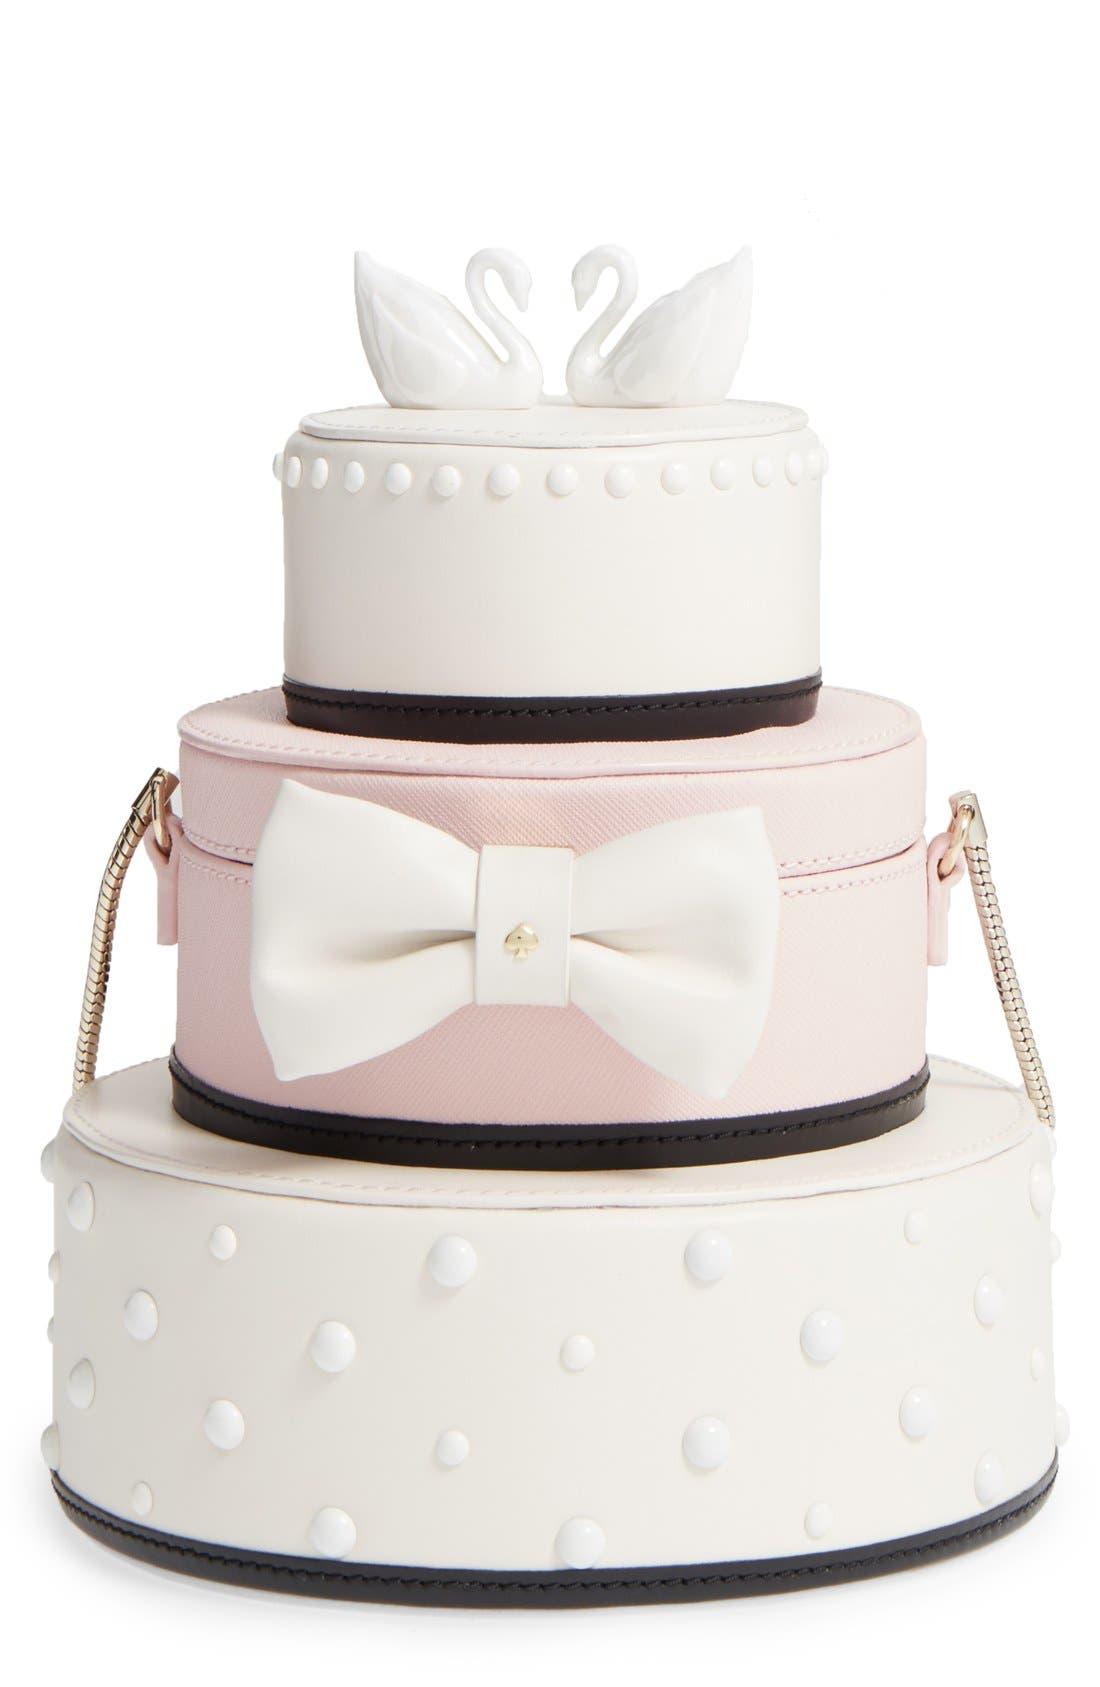 Main Image - kate spade new york 'wedding belles - cake' leather handbag